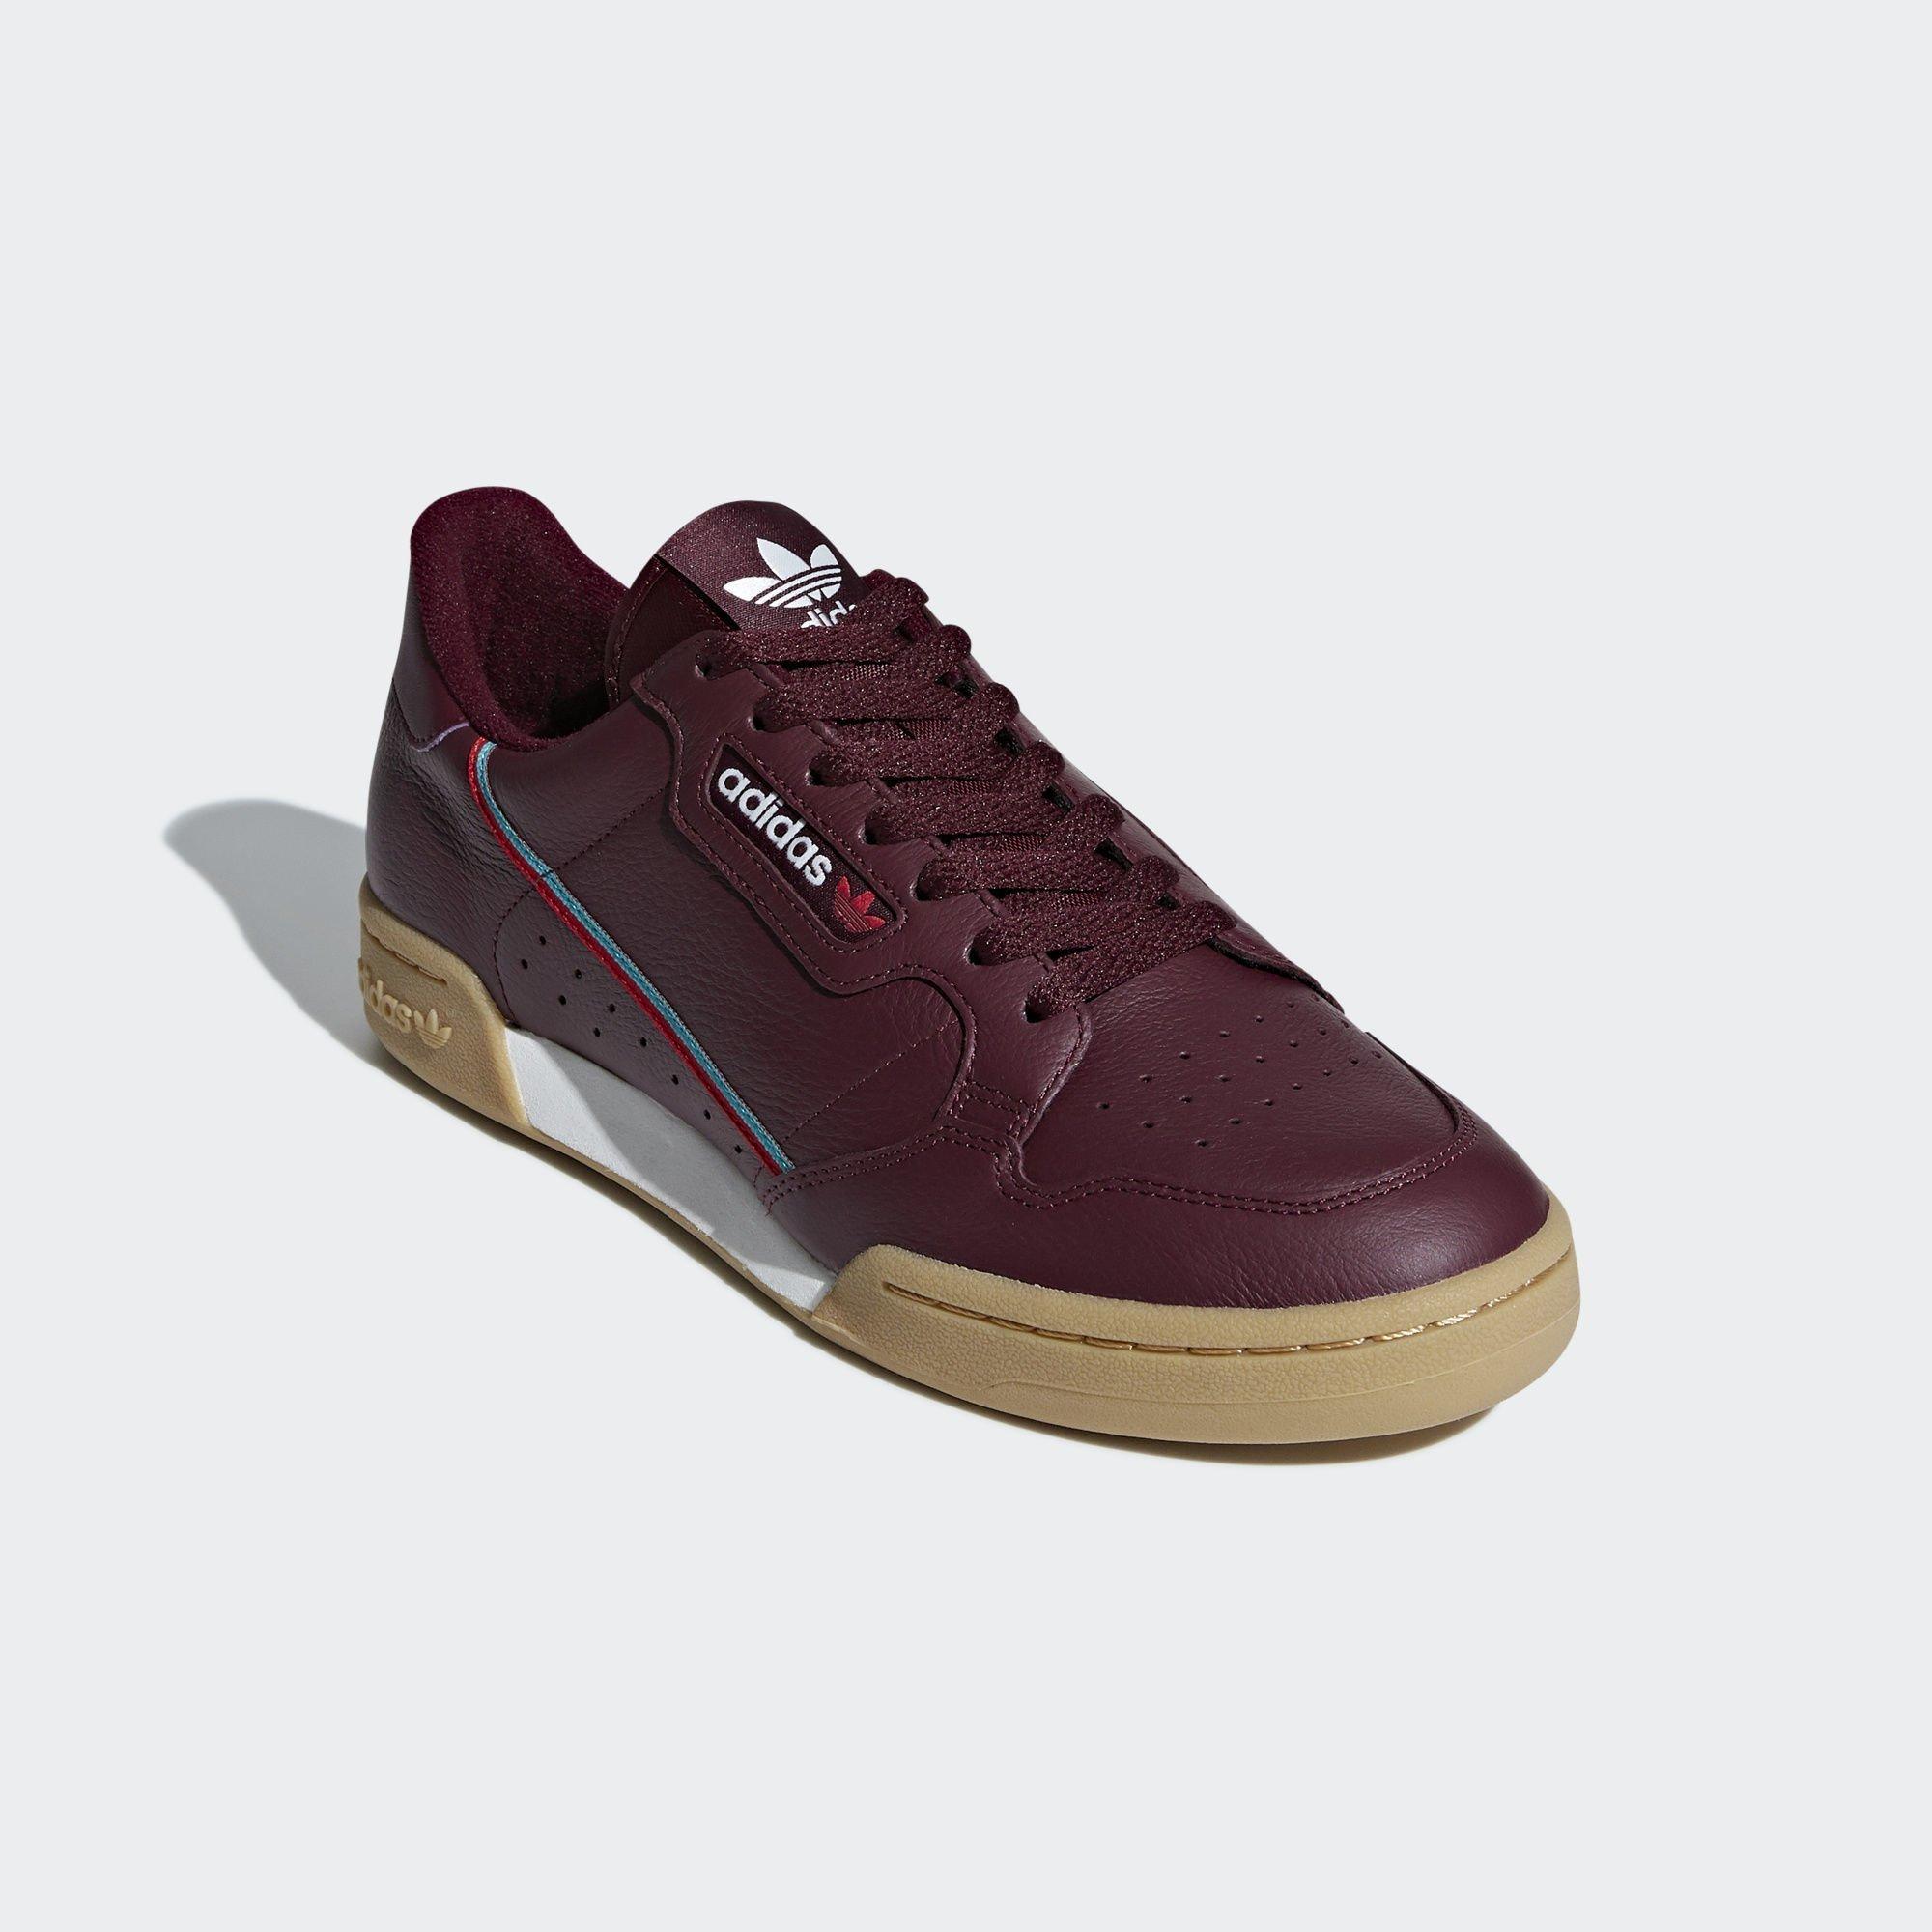 Adidas Continental 80 B41677